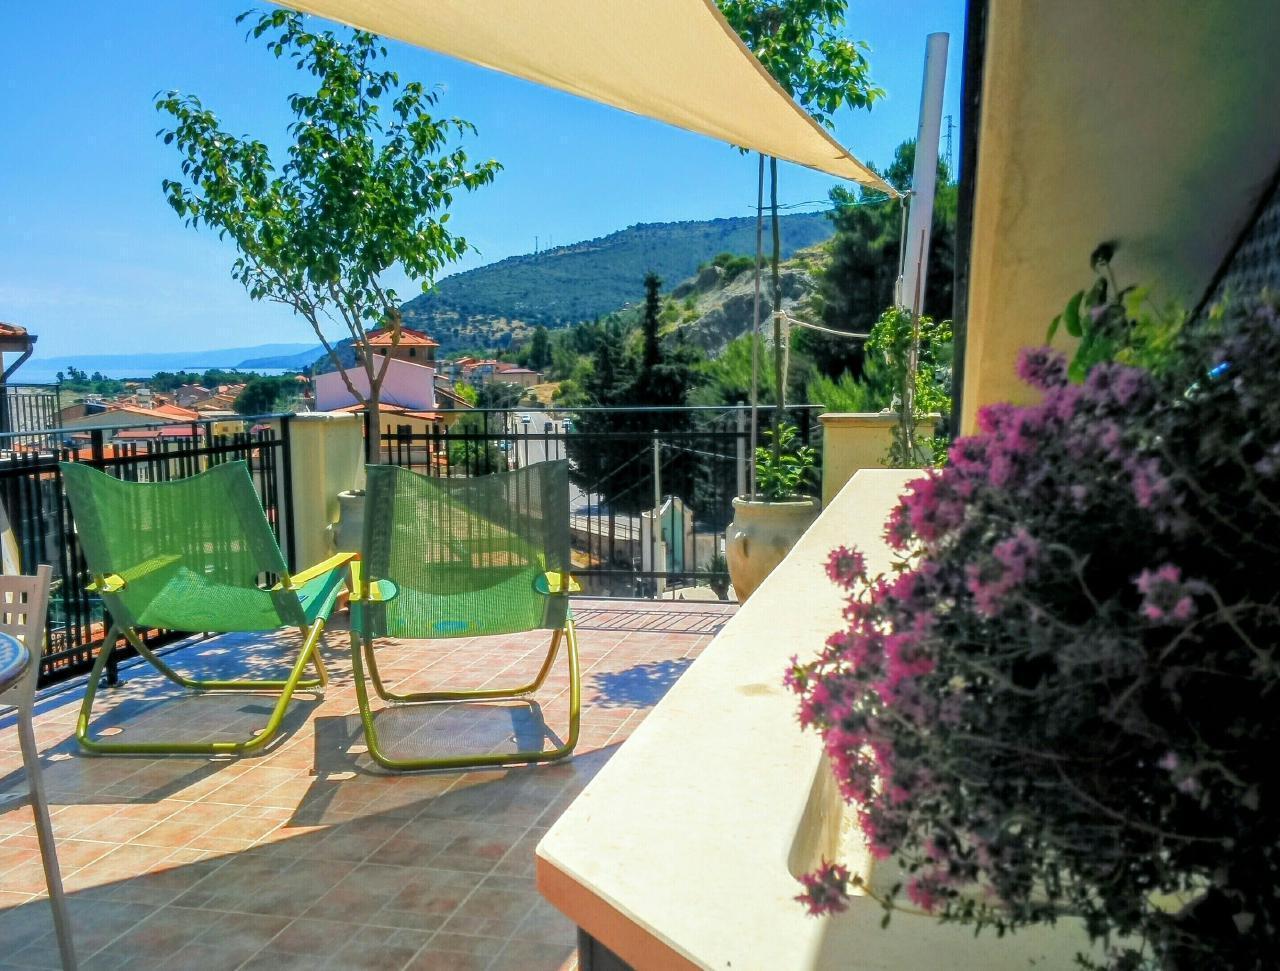 Ferienwohnung Luna Rossa Charming House Comfort (718076), Tusa, Messina, Sizilien, Italien, Bild 1